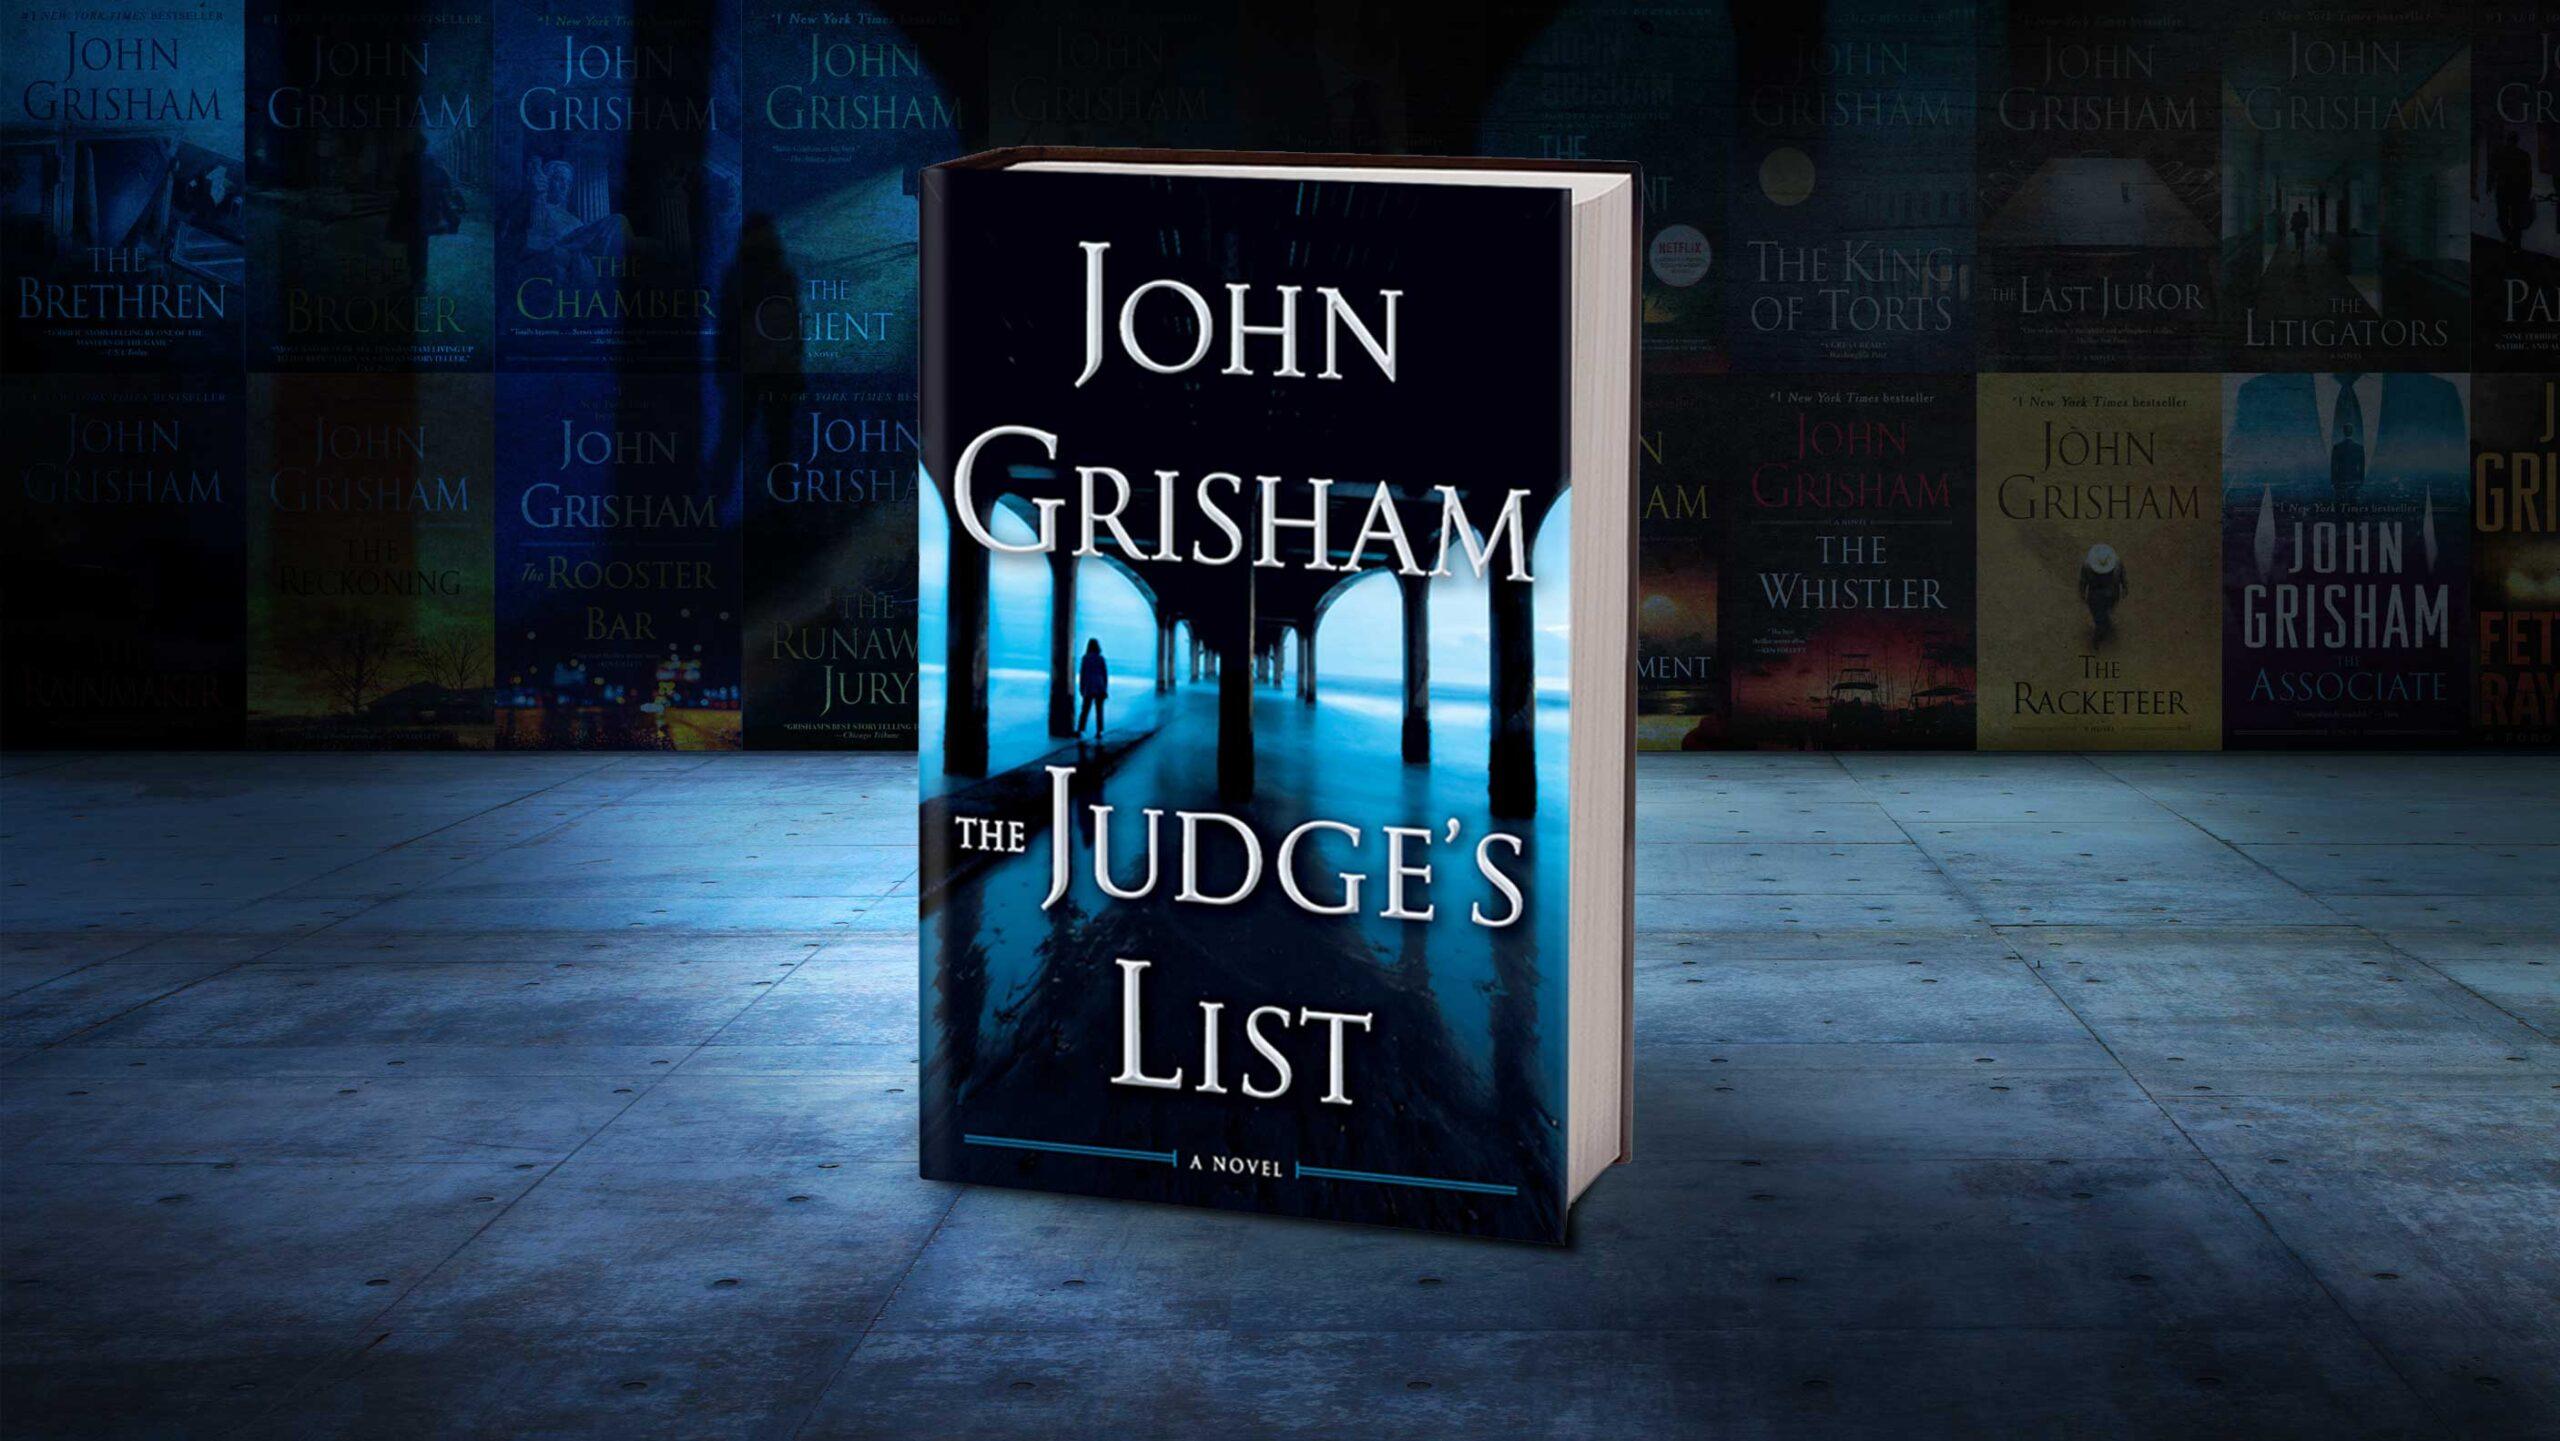 The Judge's List – by John Grisham